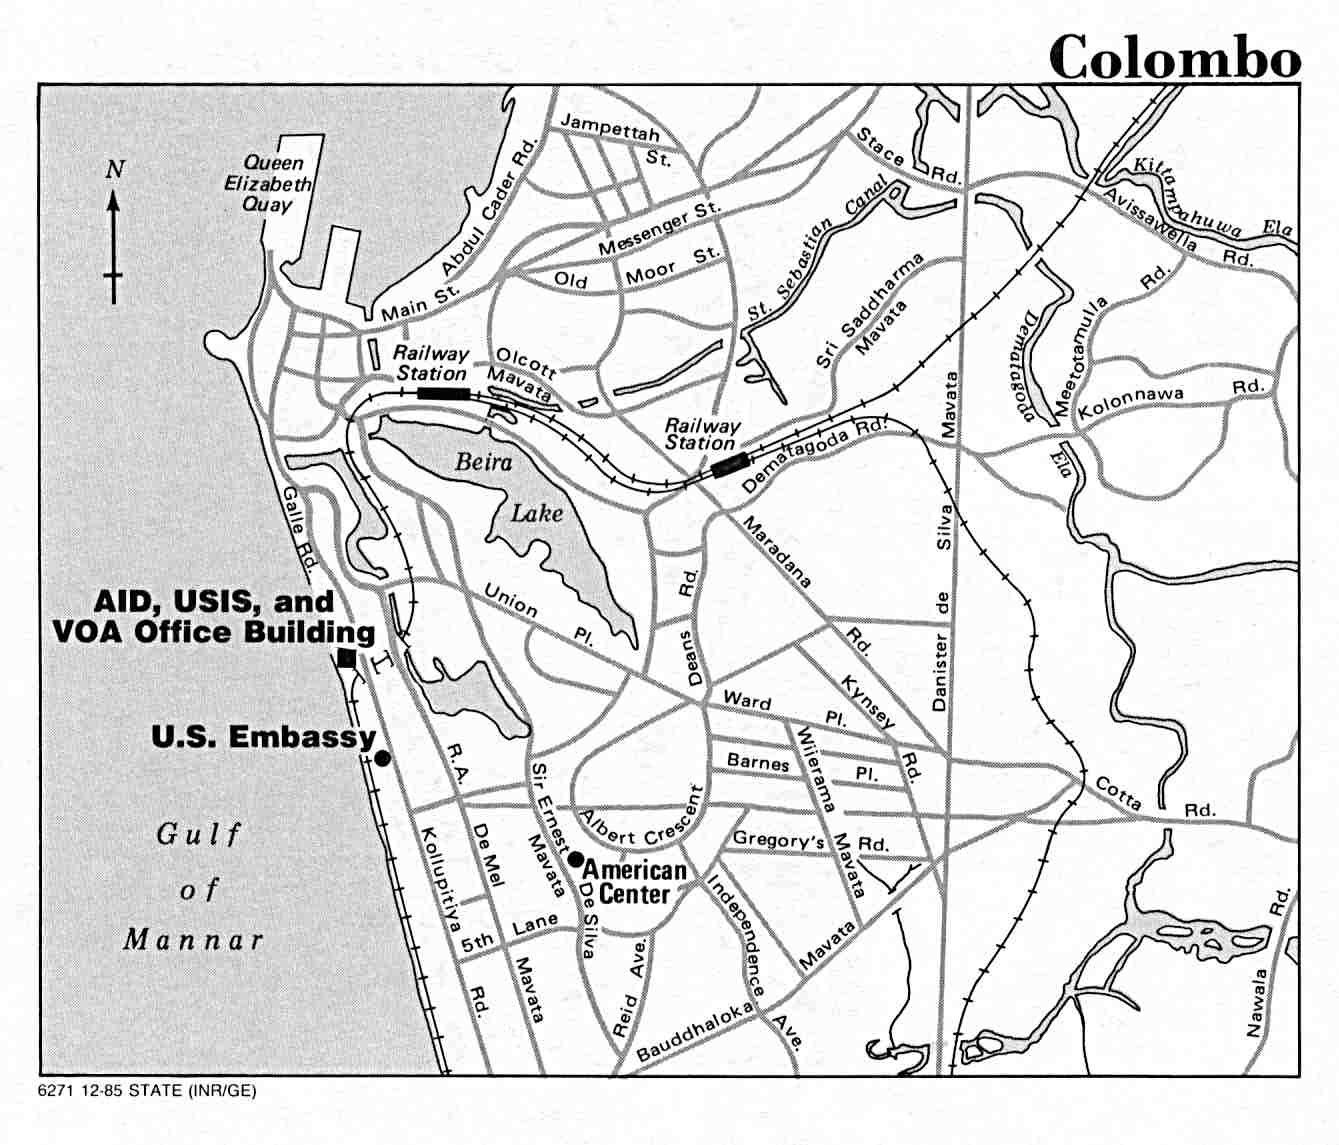 Colombo City Map, Sri Lanka 1985